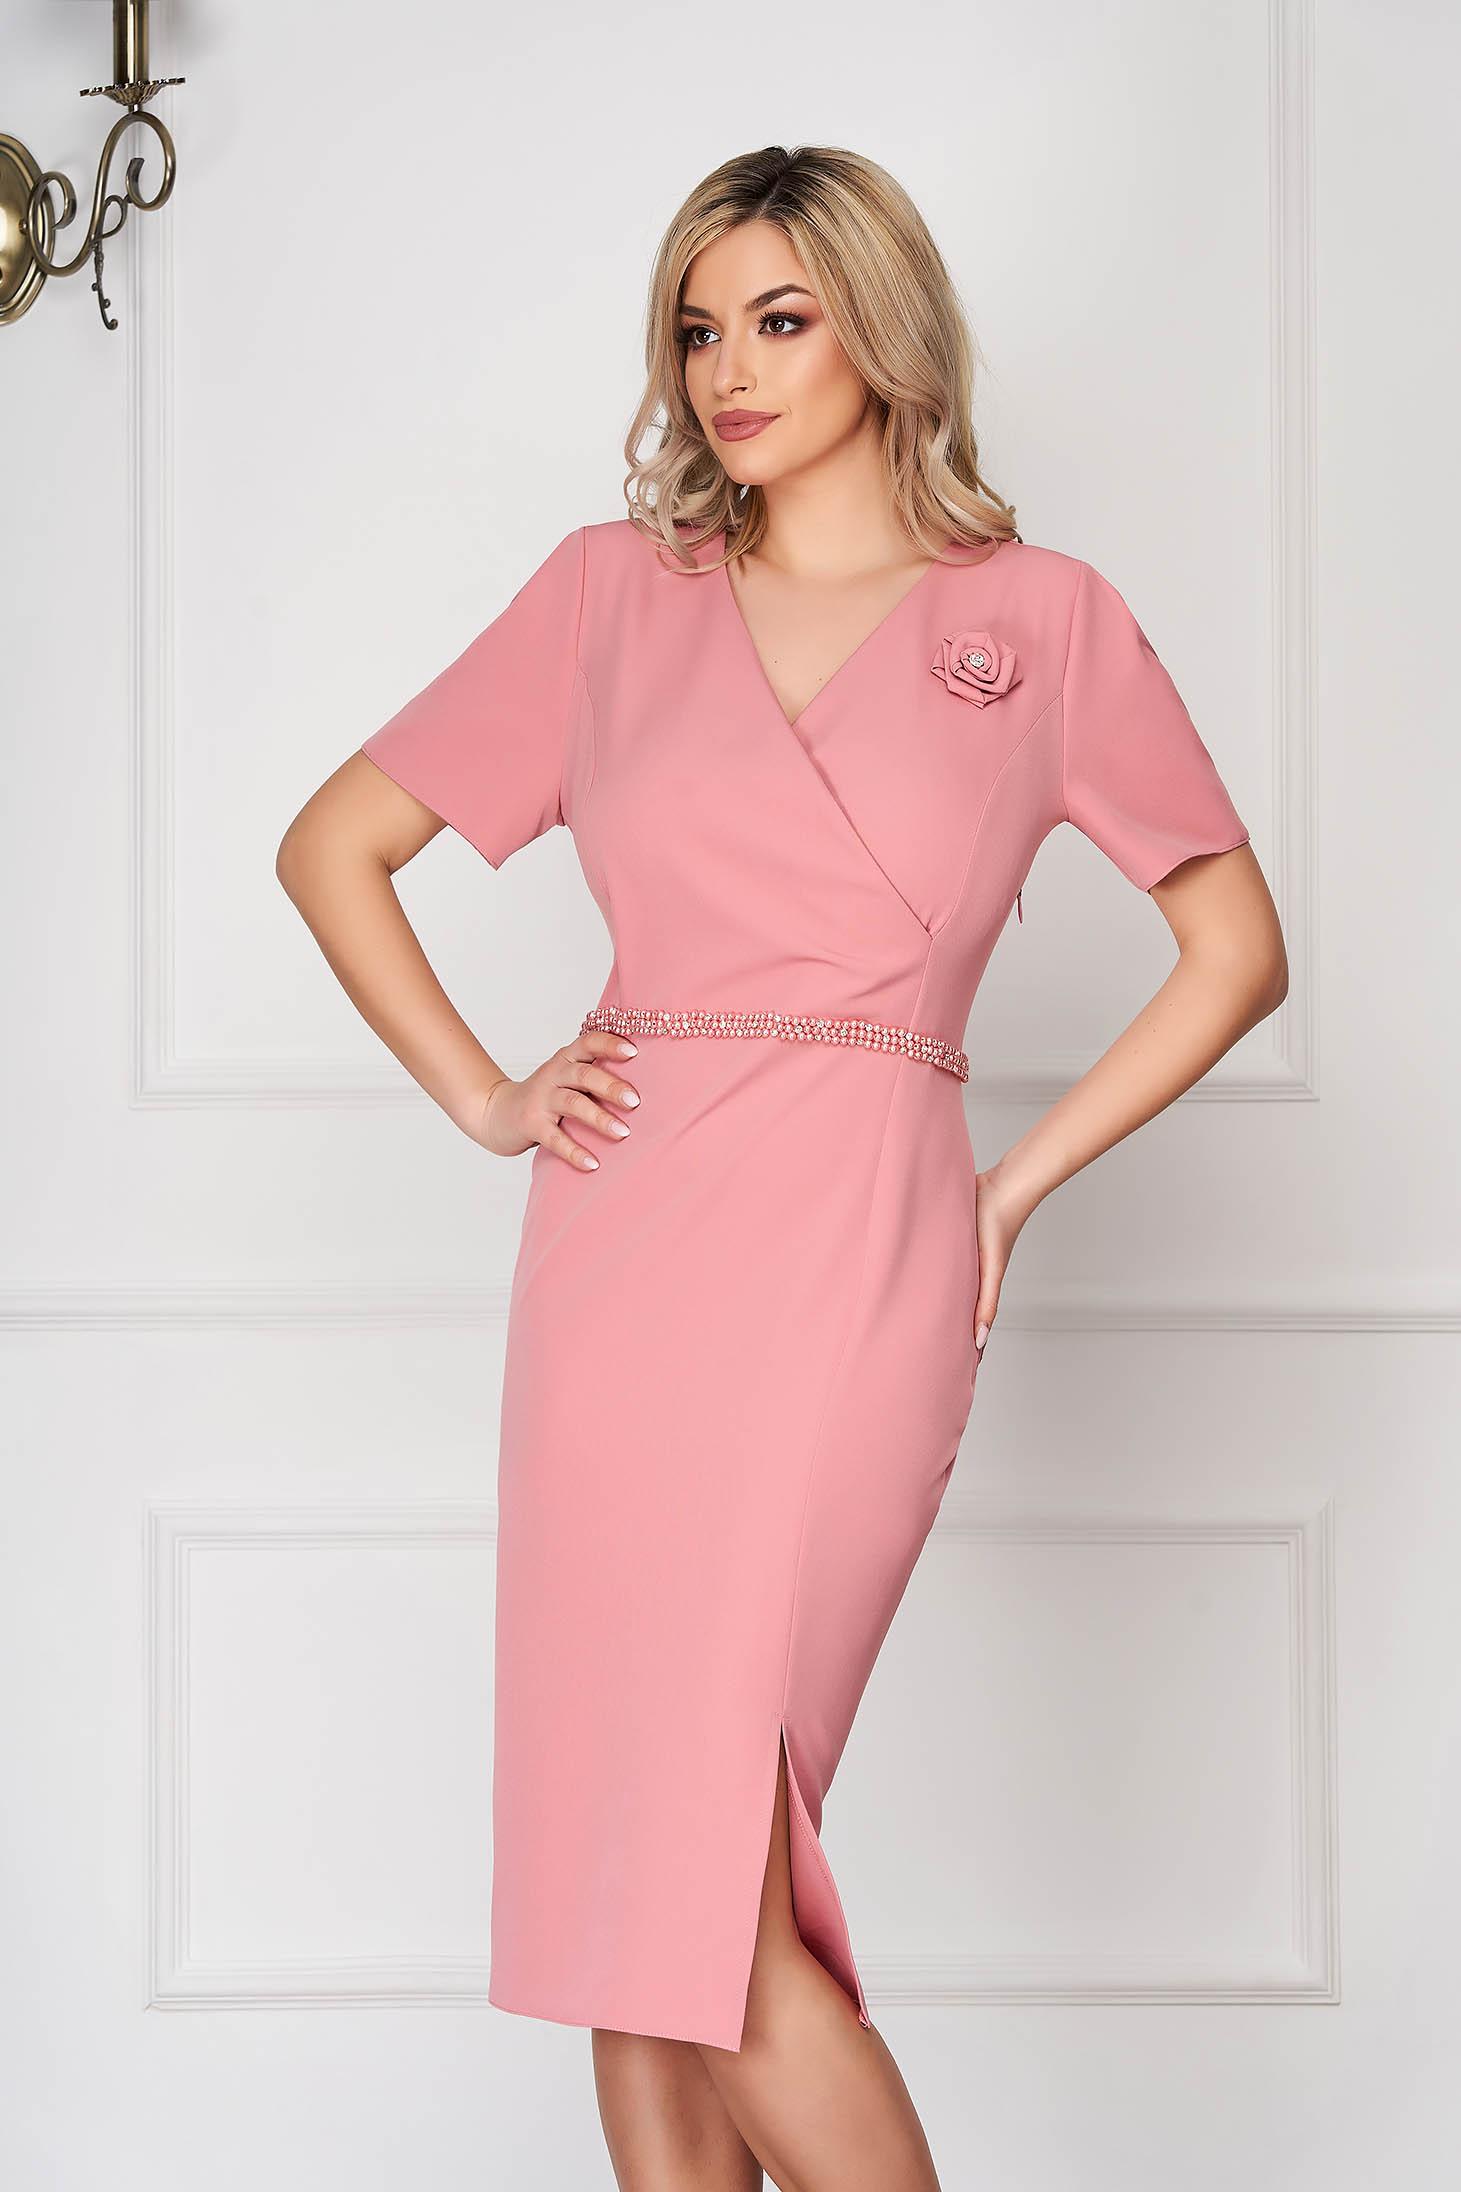 Lightpink dress elegant midi pencil short sleeves cloth thin fabric